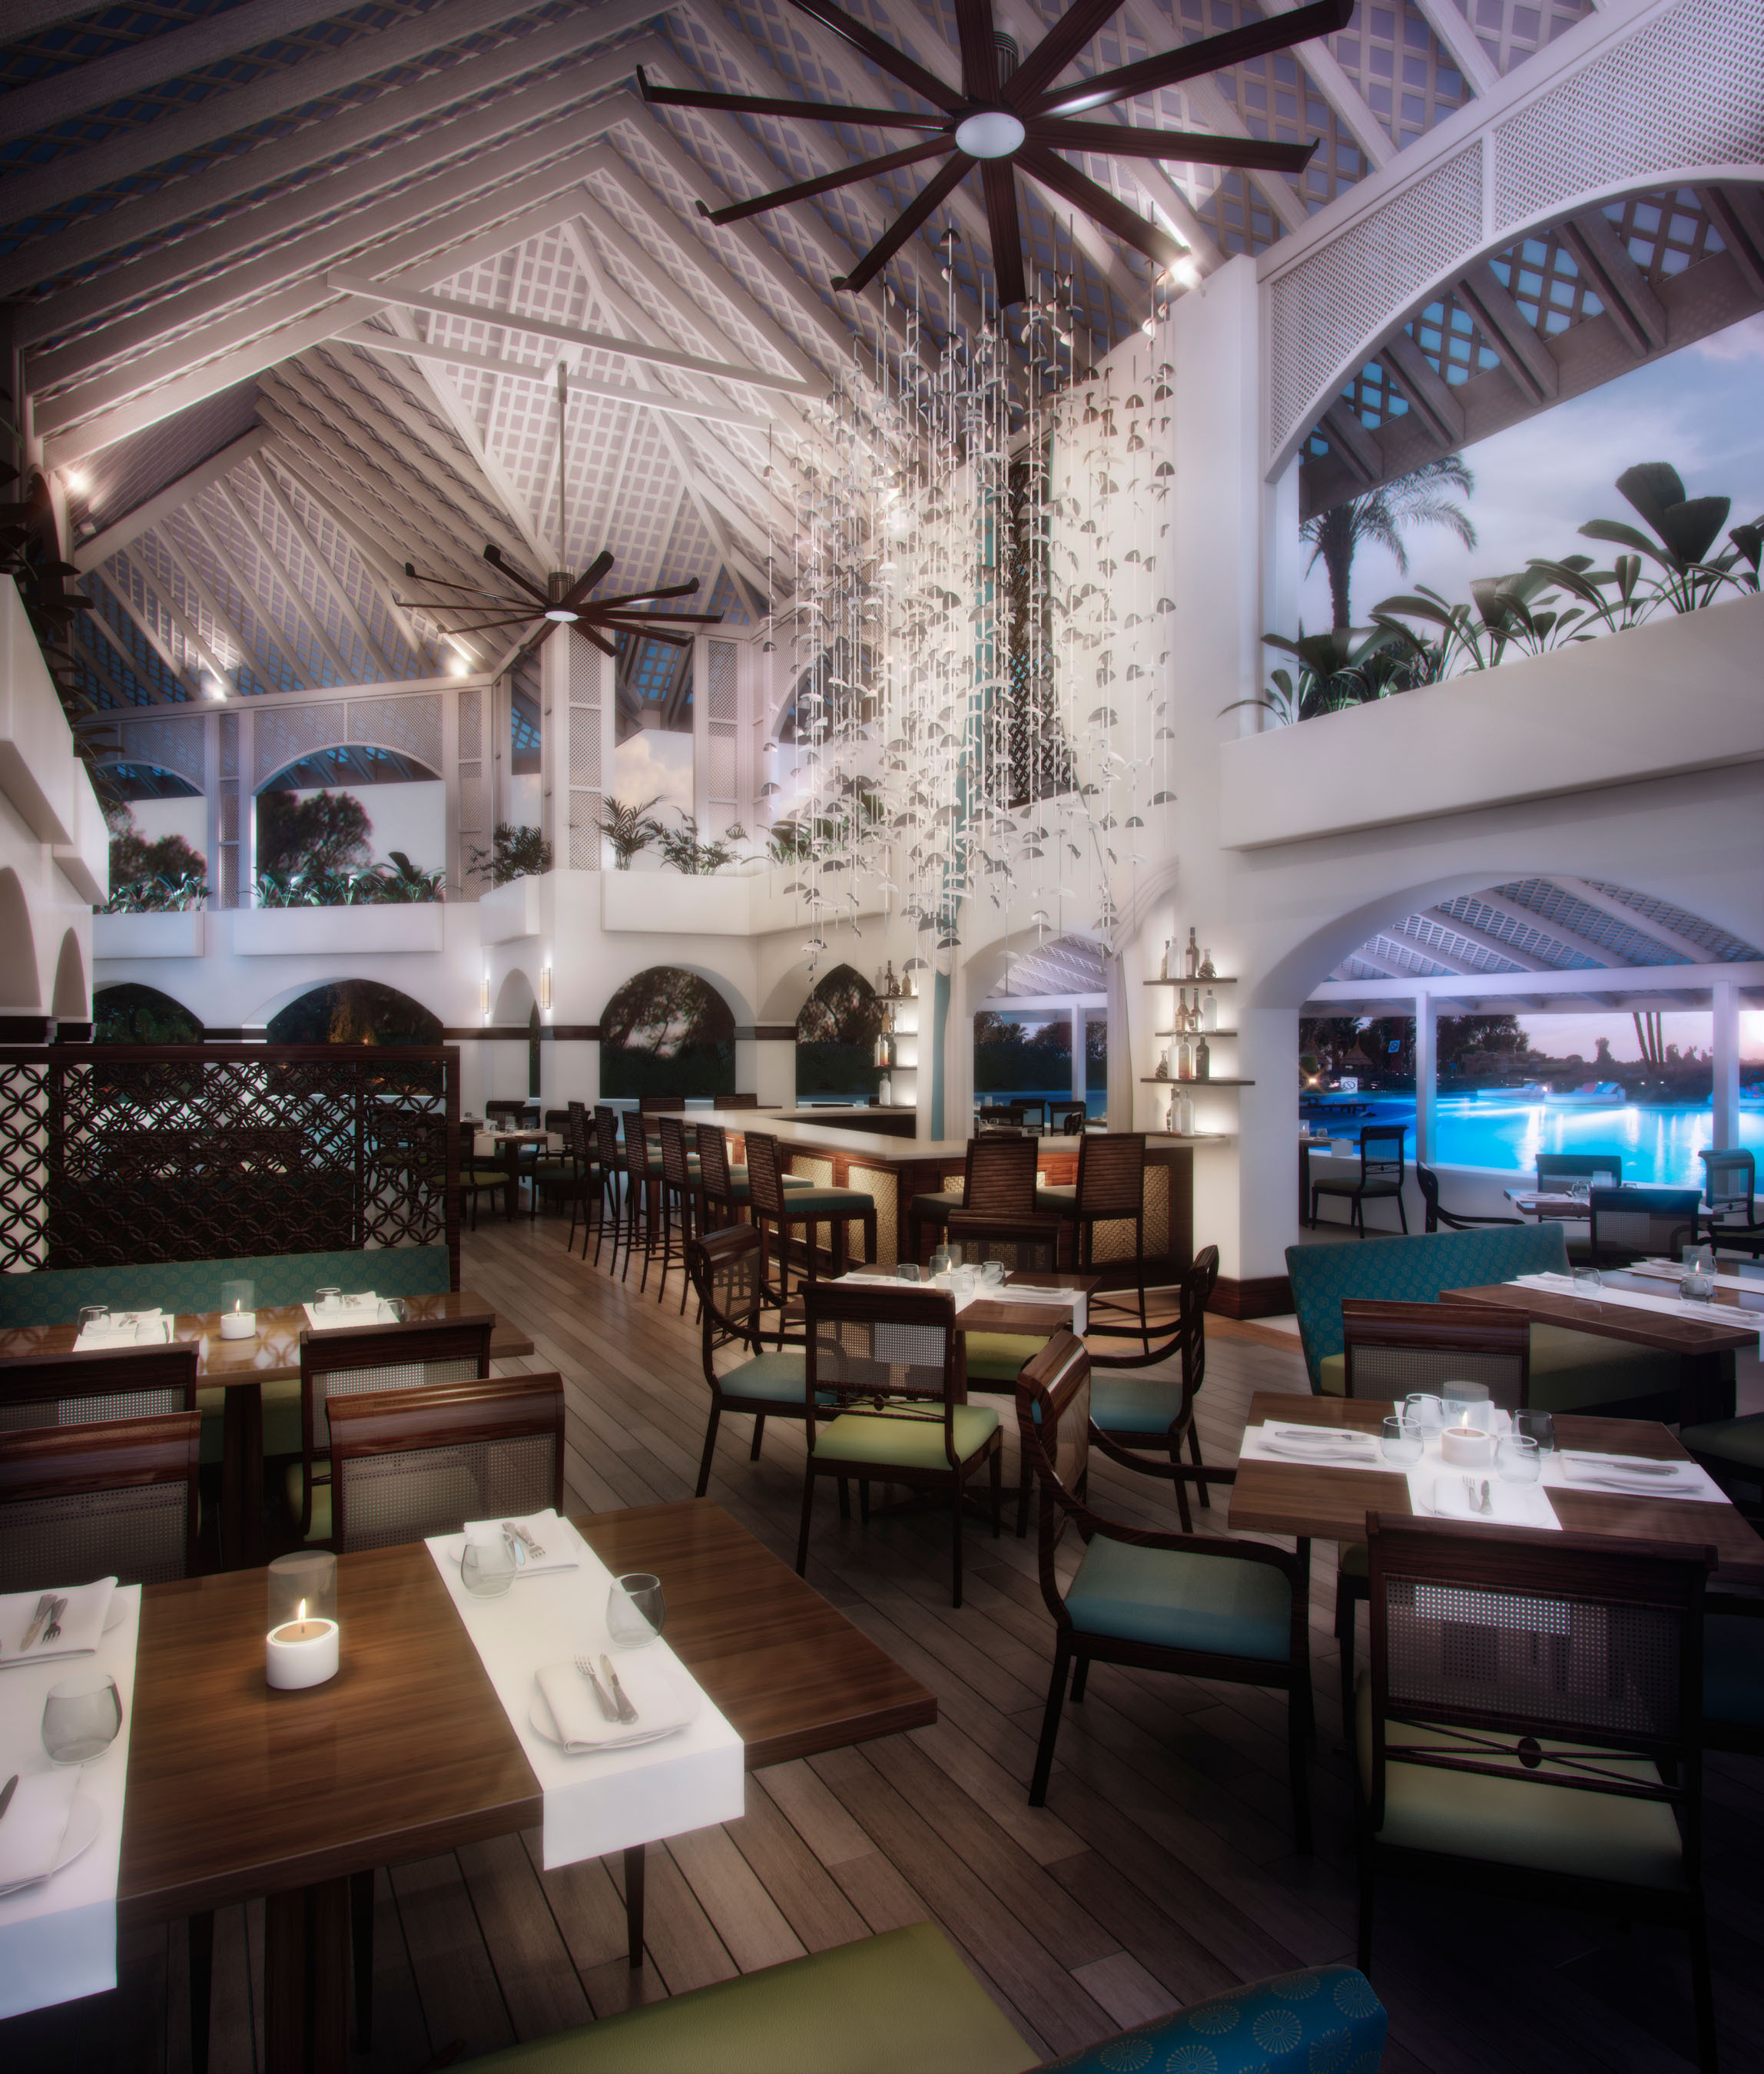 The Laguna Restaurant and Bar.  (PRNewsFoto/Elegant Hotels Group)